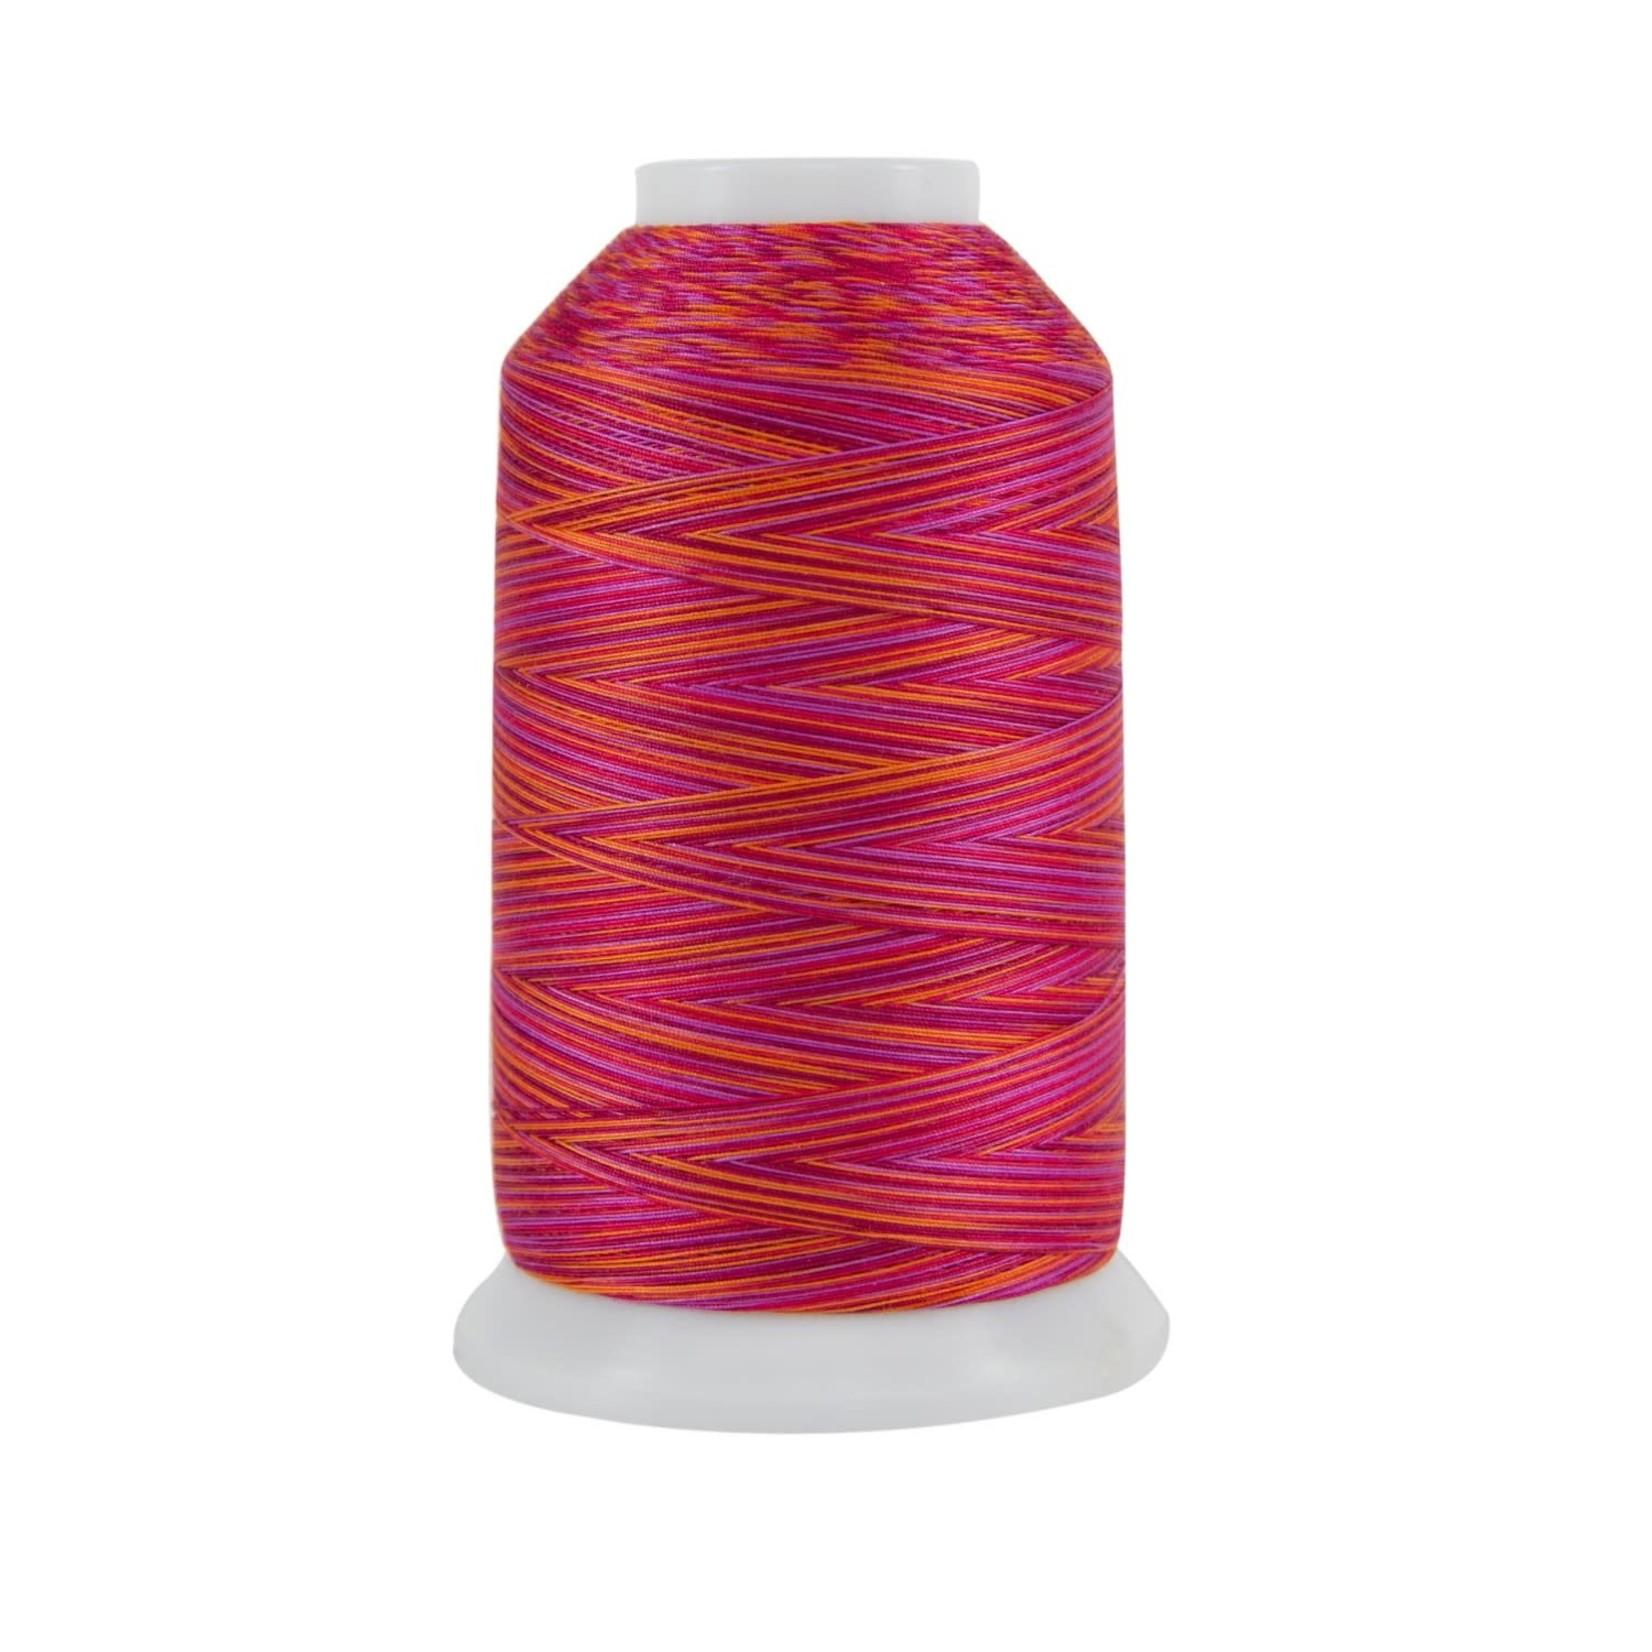 Superior Threads King Tut - #40 - 1828 m - 0914 Ramses Red